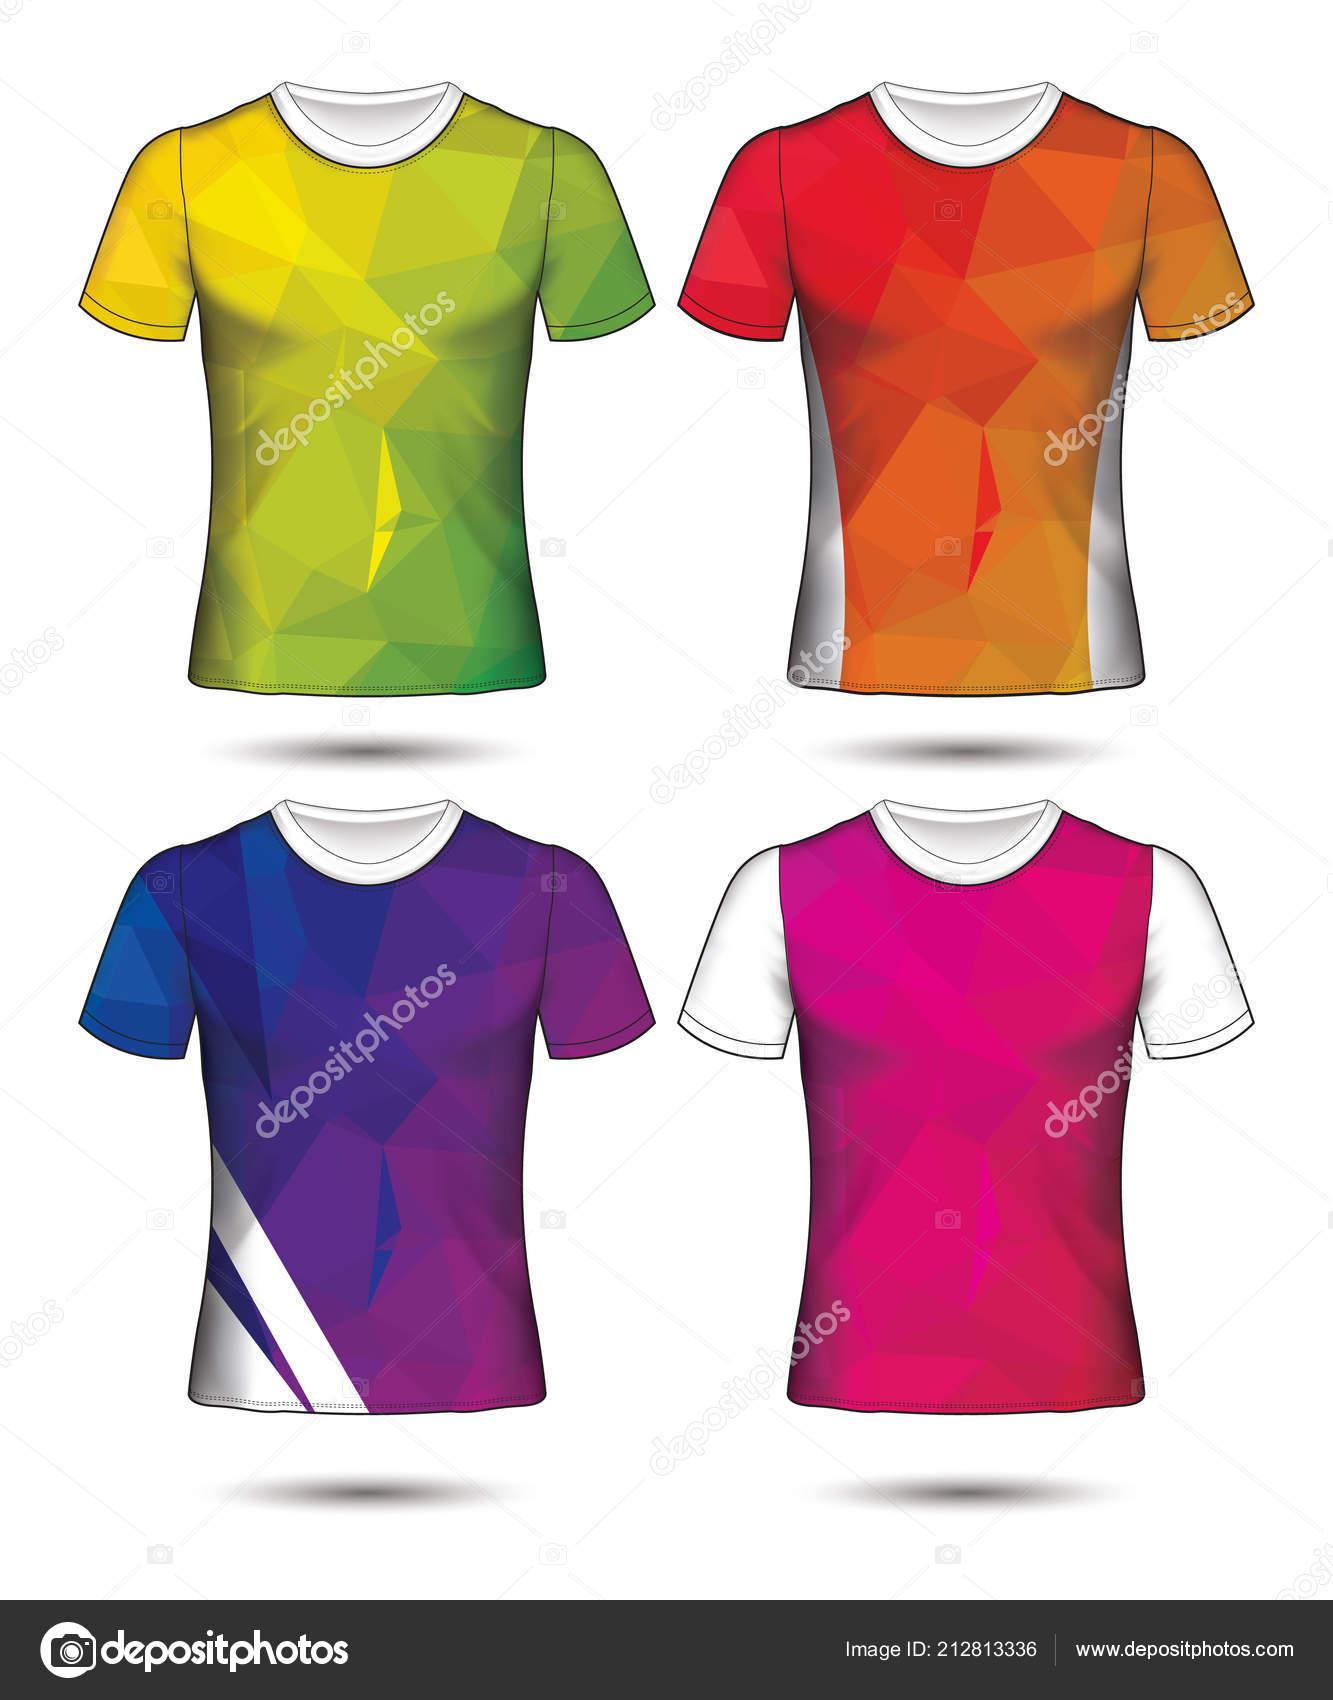 dff289f35e12 Πουκάμισο Πρότυπο Πλάτη Διάνυσμα Μέτωπο Σχεδιασμός Λευκό Shirt Μόδα Ρούχα — Διανυσματικό  Αρχείο